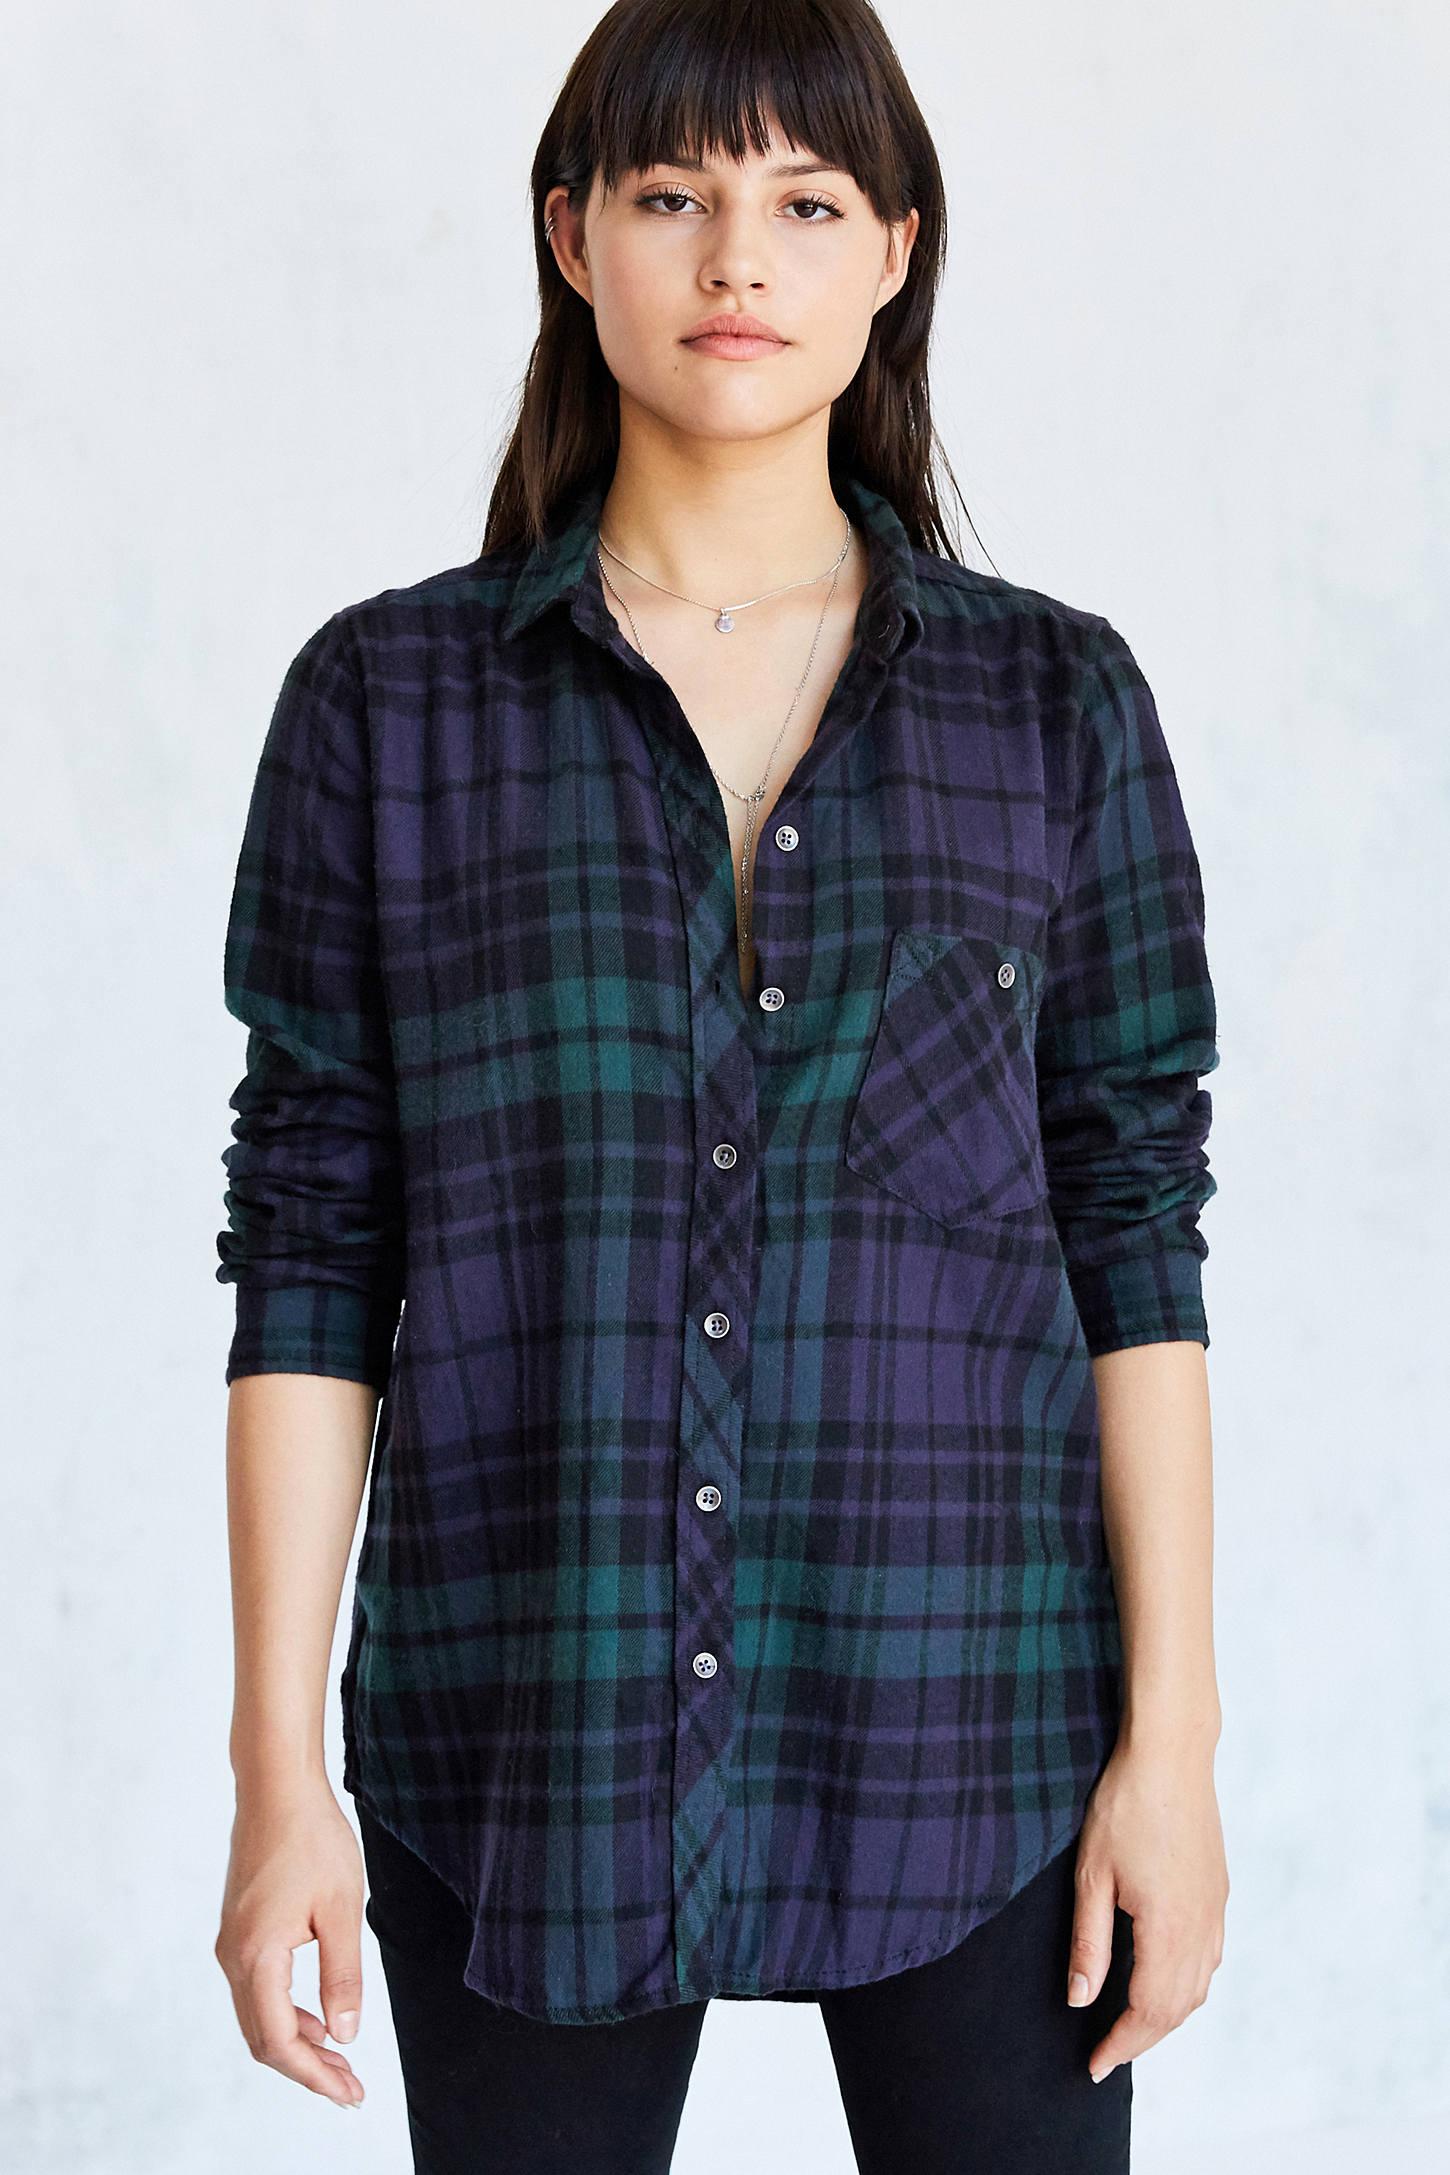 Shirt design female - Slide View 1 Bdg Polly Flannel Button Down Shirt